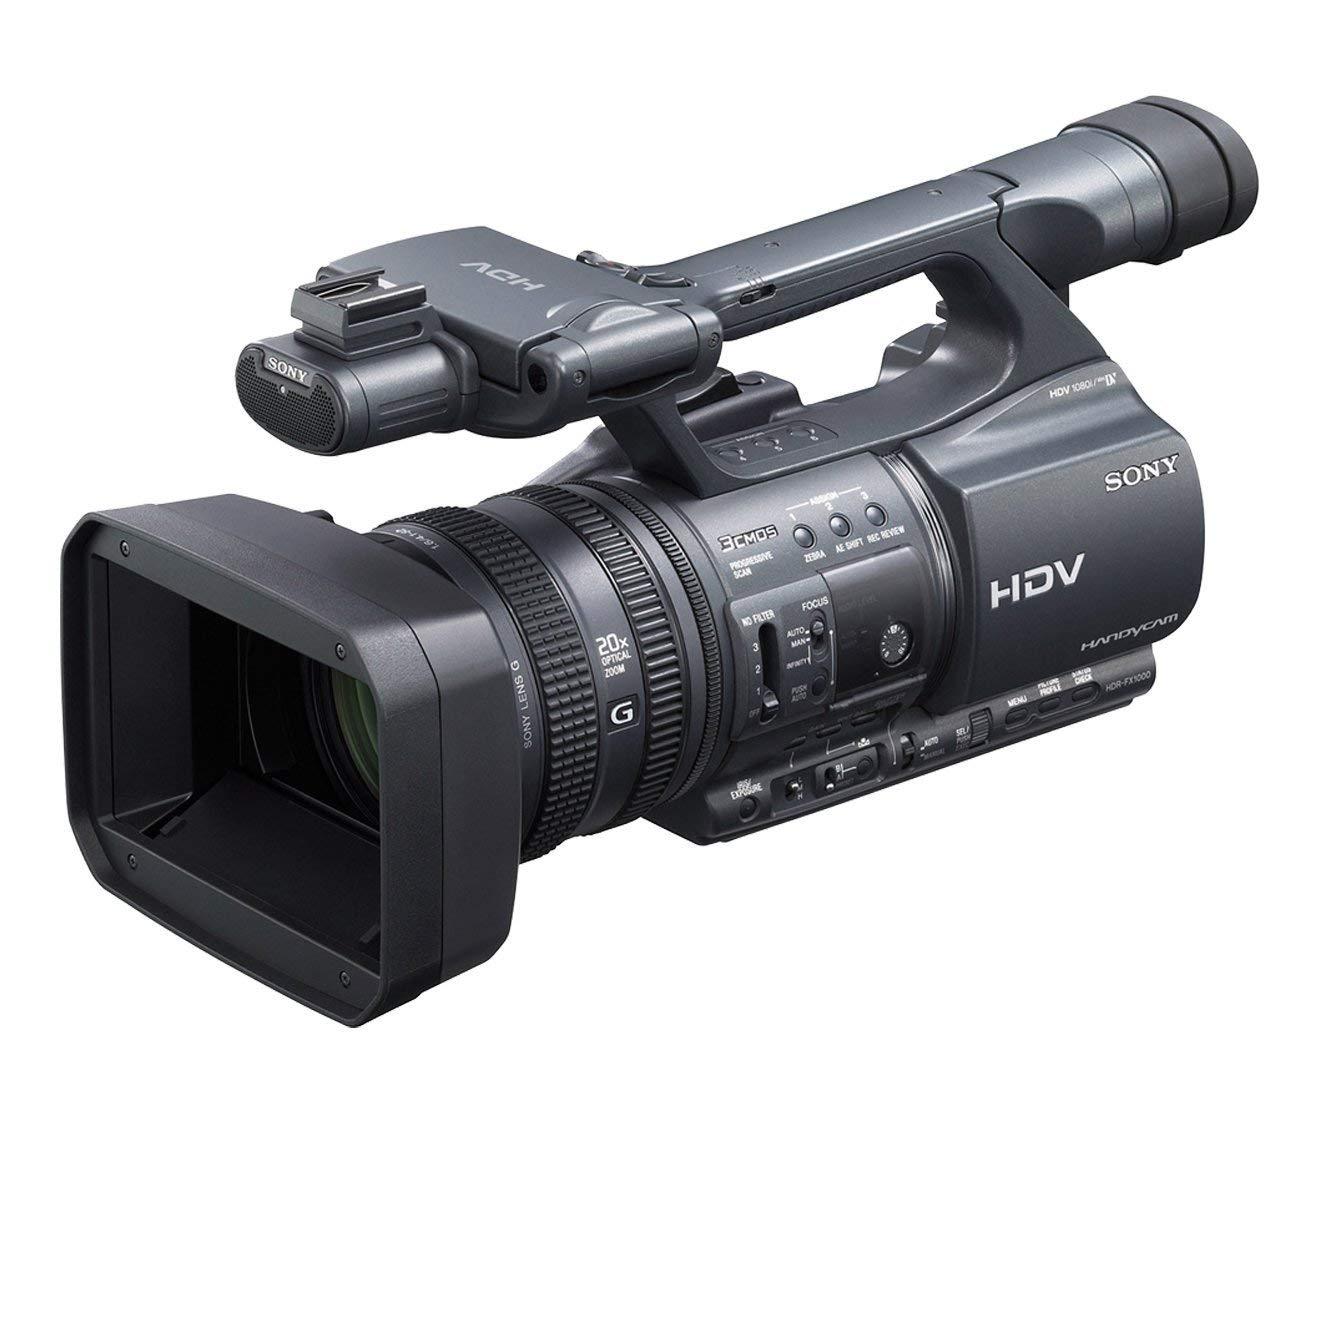 Sony HDRFX1000E - Videocámara semi profesional (pantalla de 3.2 pulgadas)